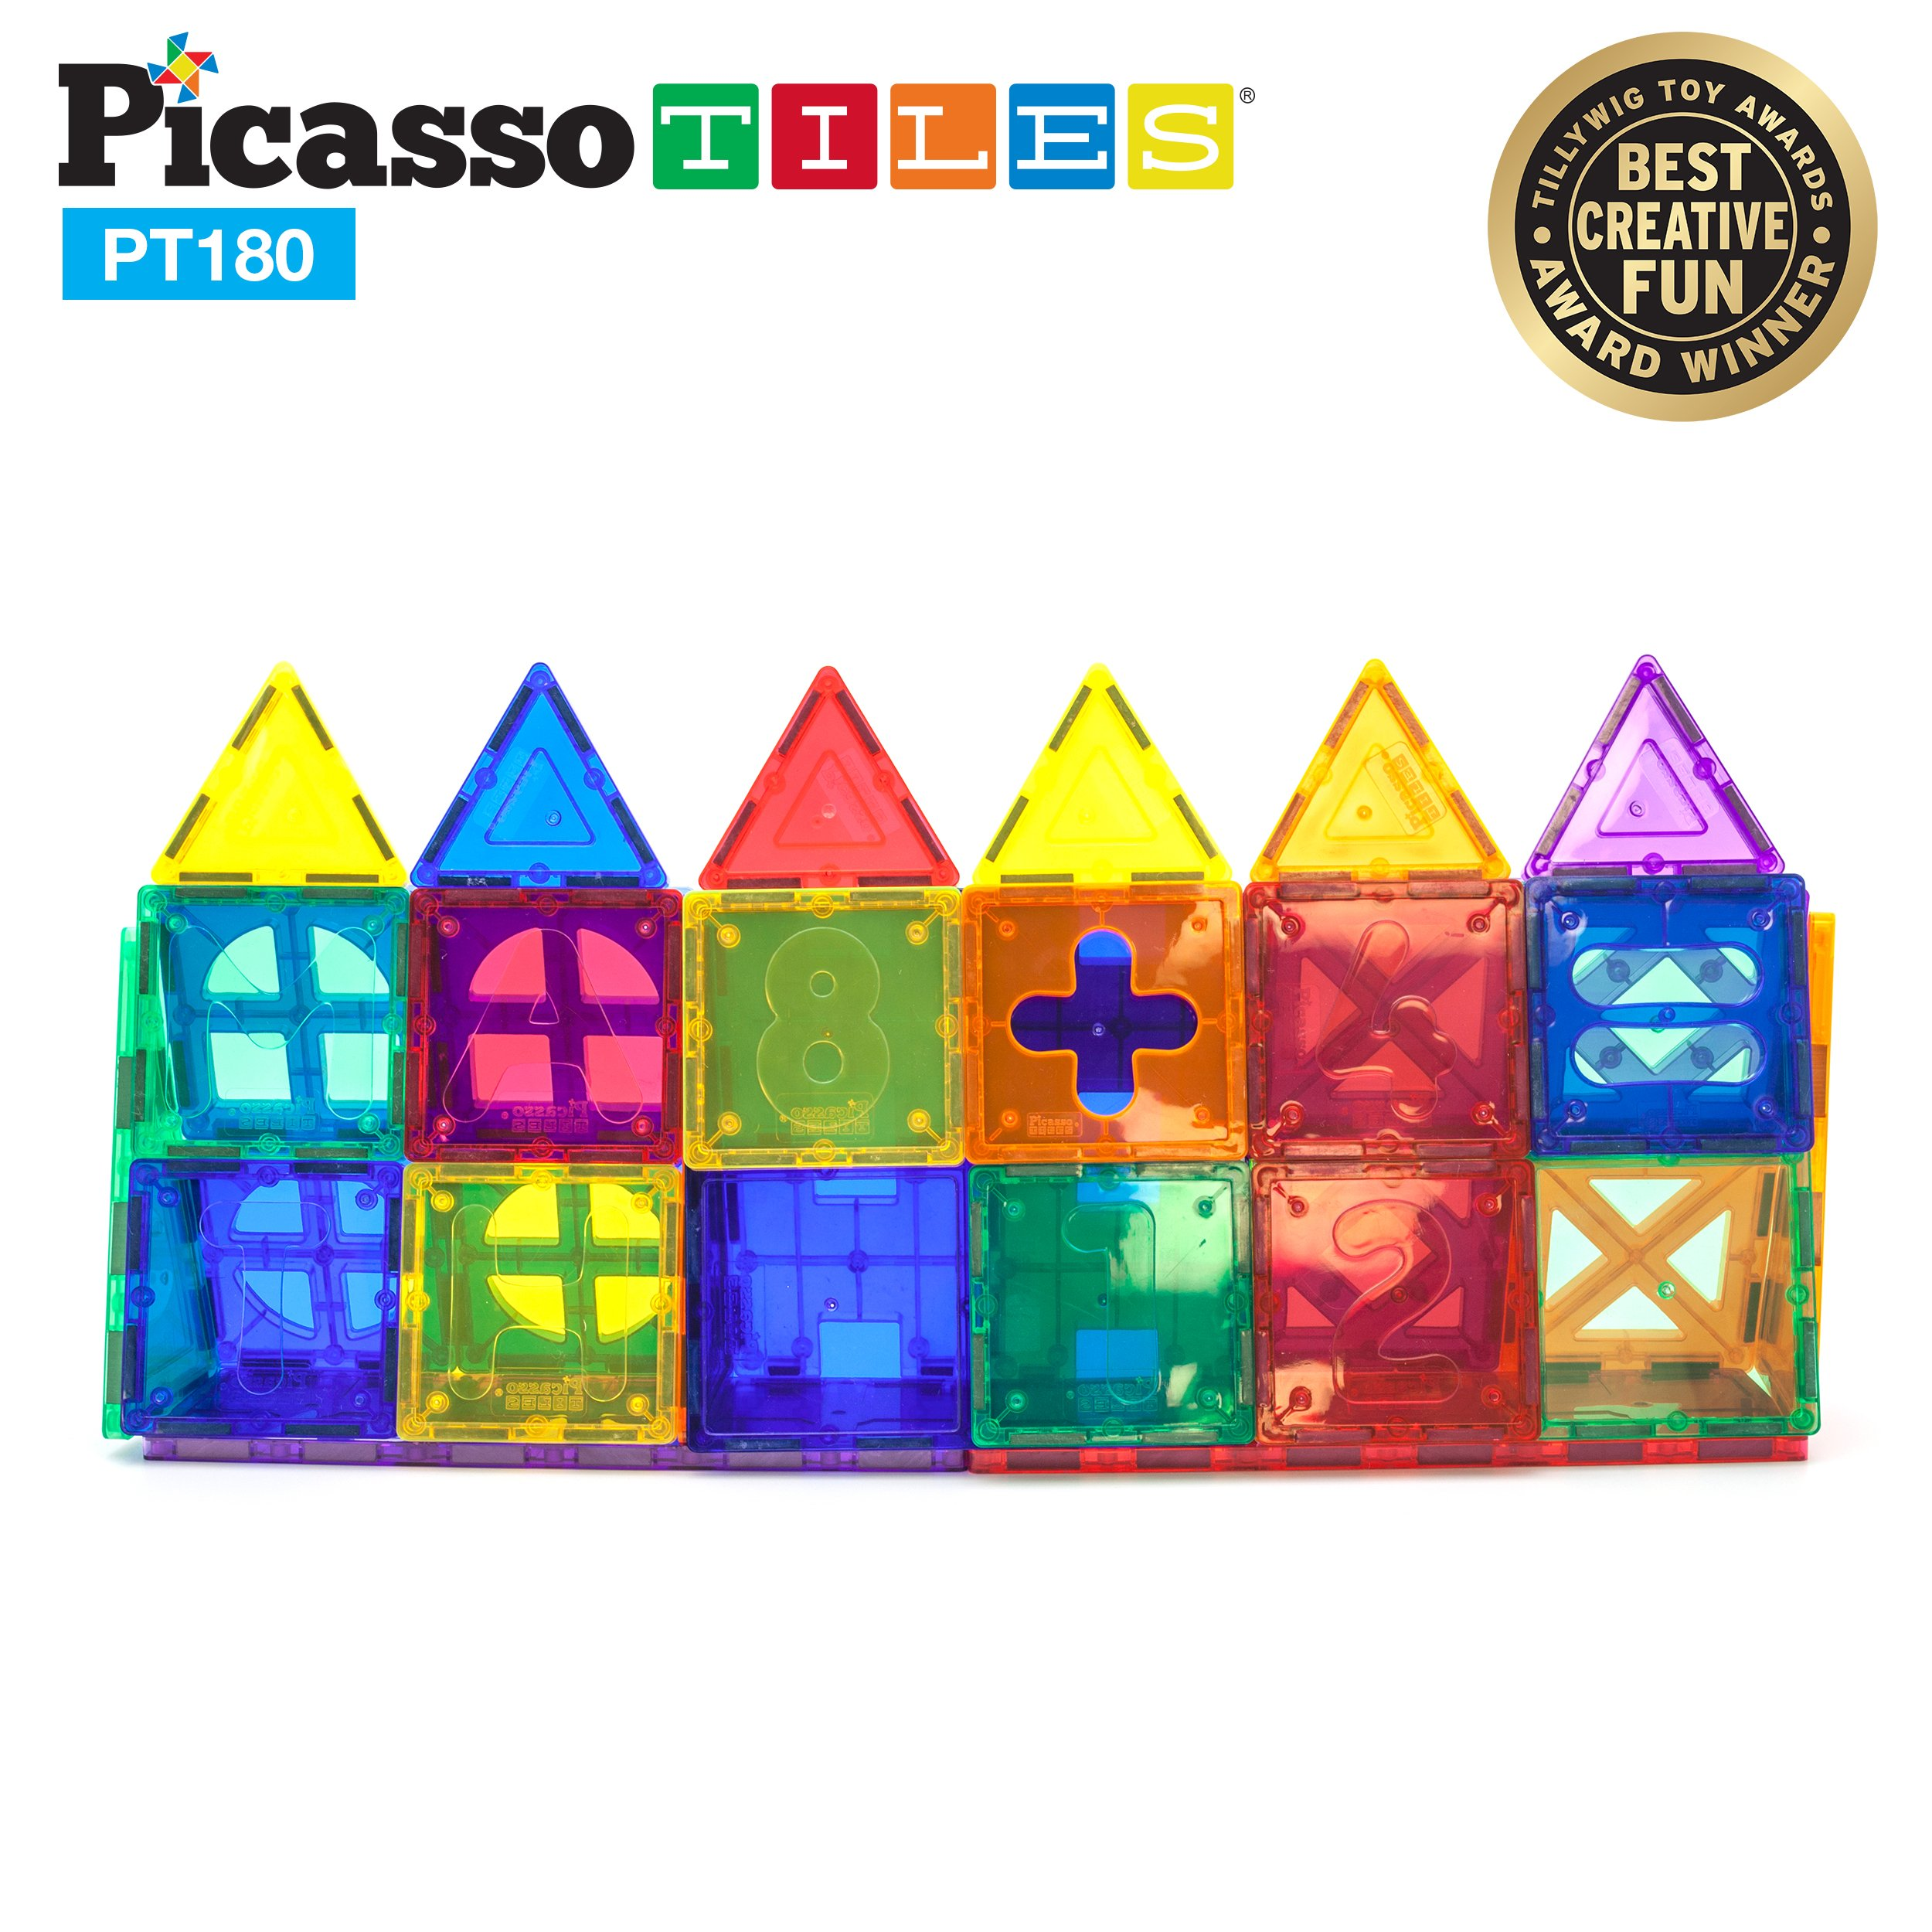 PicassoTiles PT180 Piece Set 180pc Building Block Toy Deluxe Construction Kit Magnet Building Tiles Clear Color Magnetic 3D Construction Playboards Educational Blocks Creativity Beyond Imagination by PicassoTiles (Image #7)